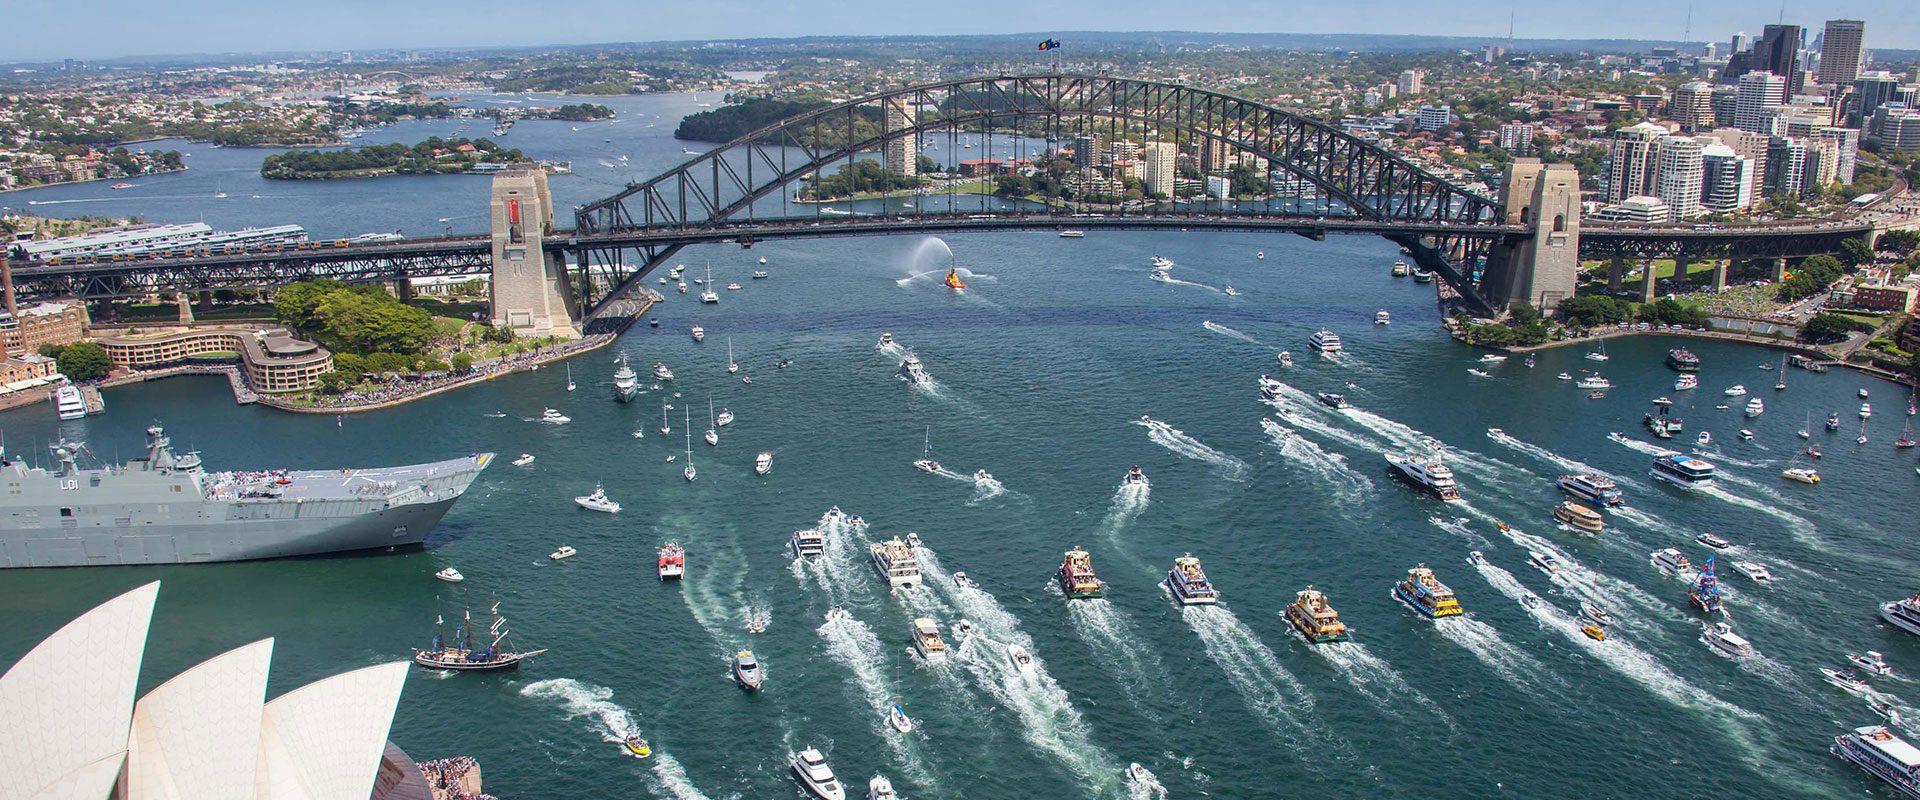 Amazing Australia - Testimonials - Skyline Holidays - Best Travel Agency in Surat, India